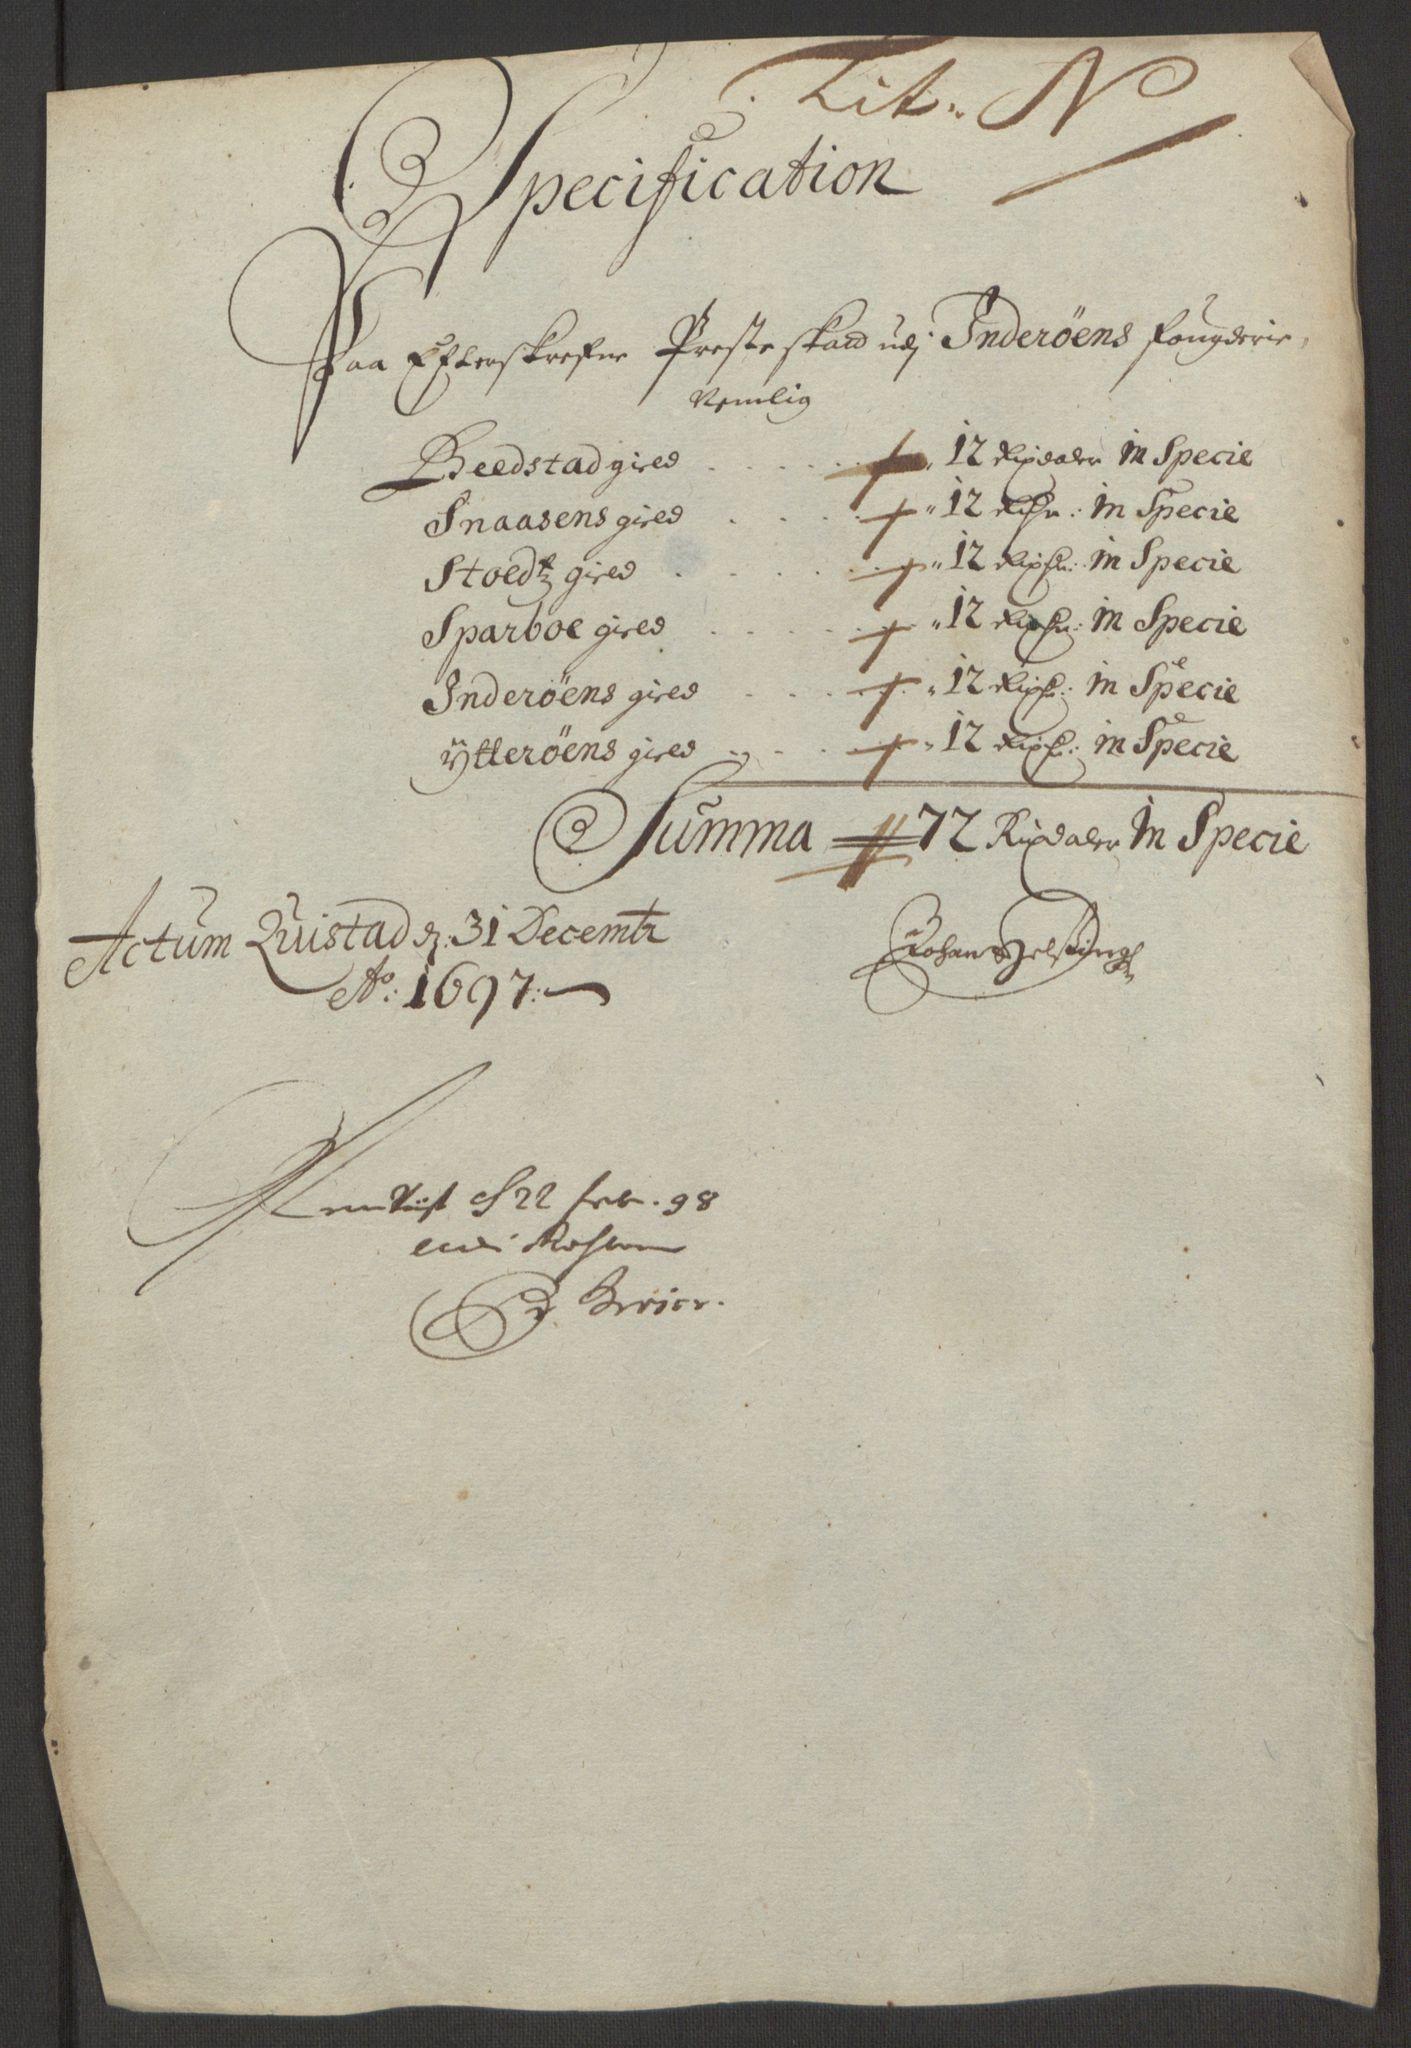 RA, Rentekammeret inntil 1814, Reviderte regnskaper, Fogderegnskap, R63/L4309: Fogderegnskap Inderøy, 1695-1697, s. 499